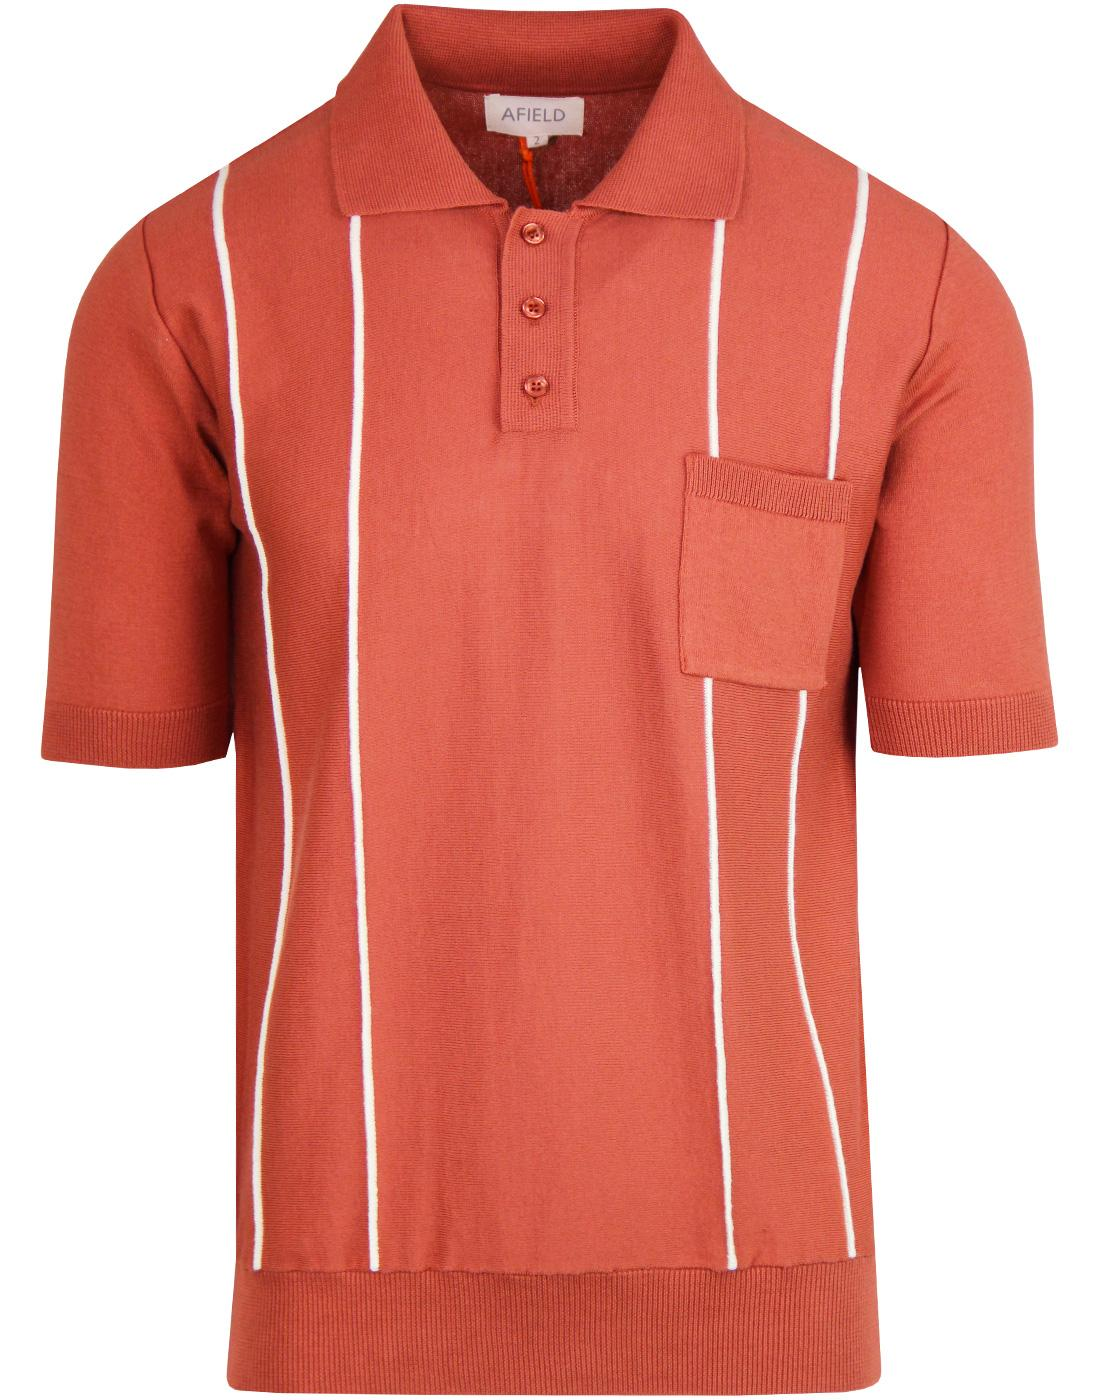 Alfaro AFIELD Mod Stripe Knit Polo Top BRUSCHETTA